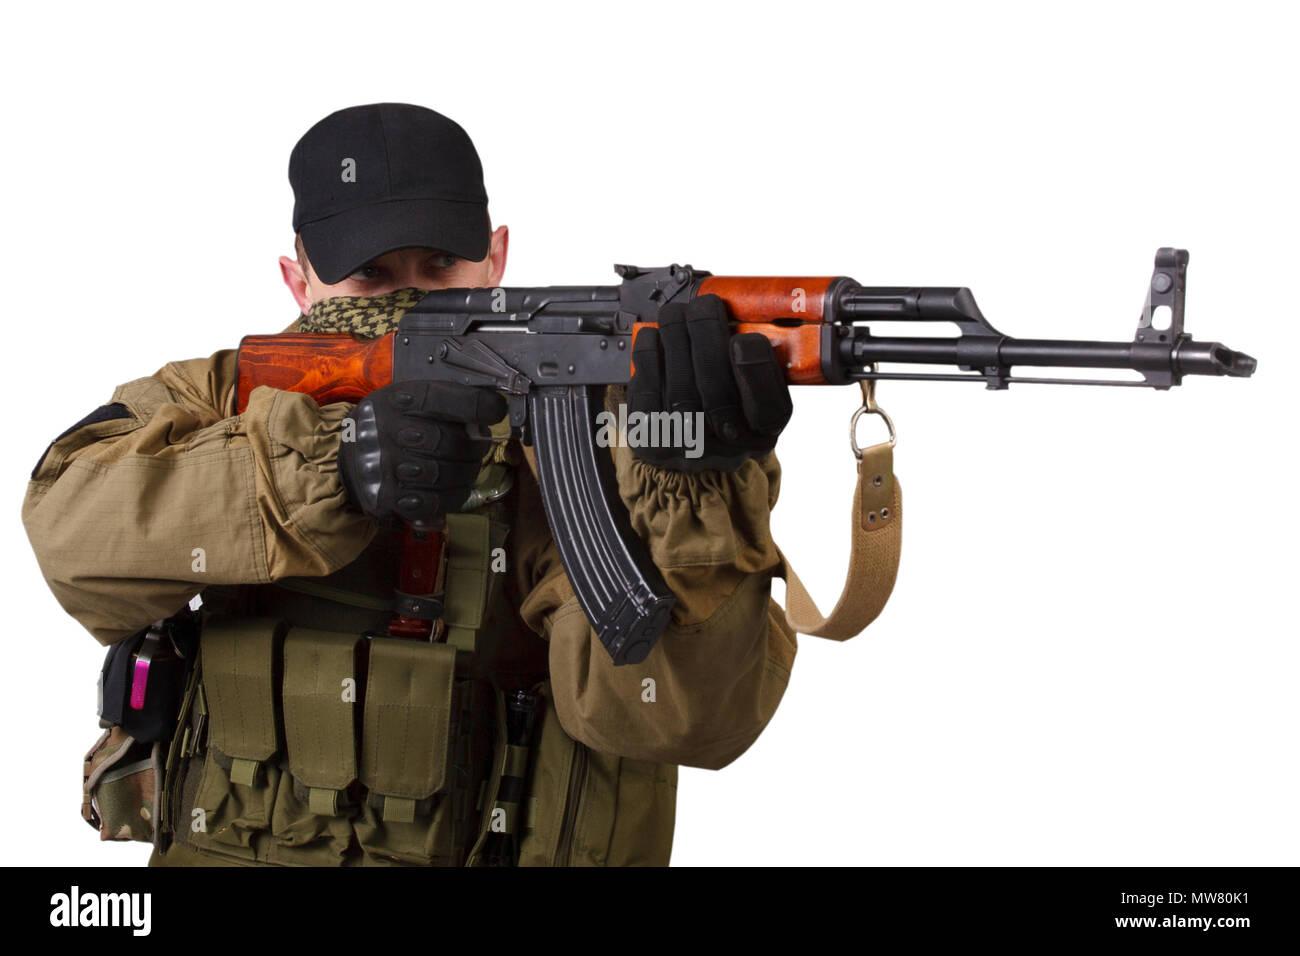 Man Holding Ak47 Gun Stock Photos & Man Holding Ak47 Gun